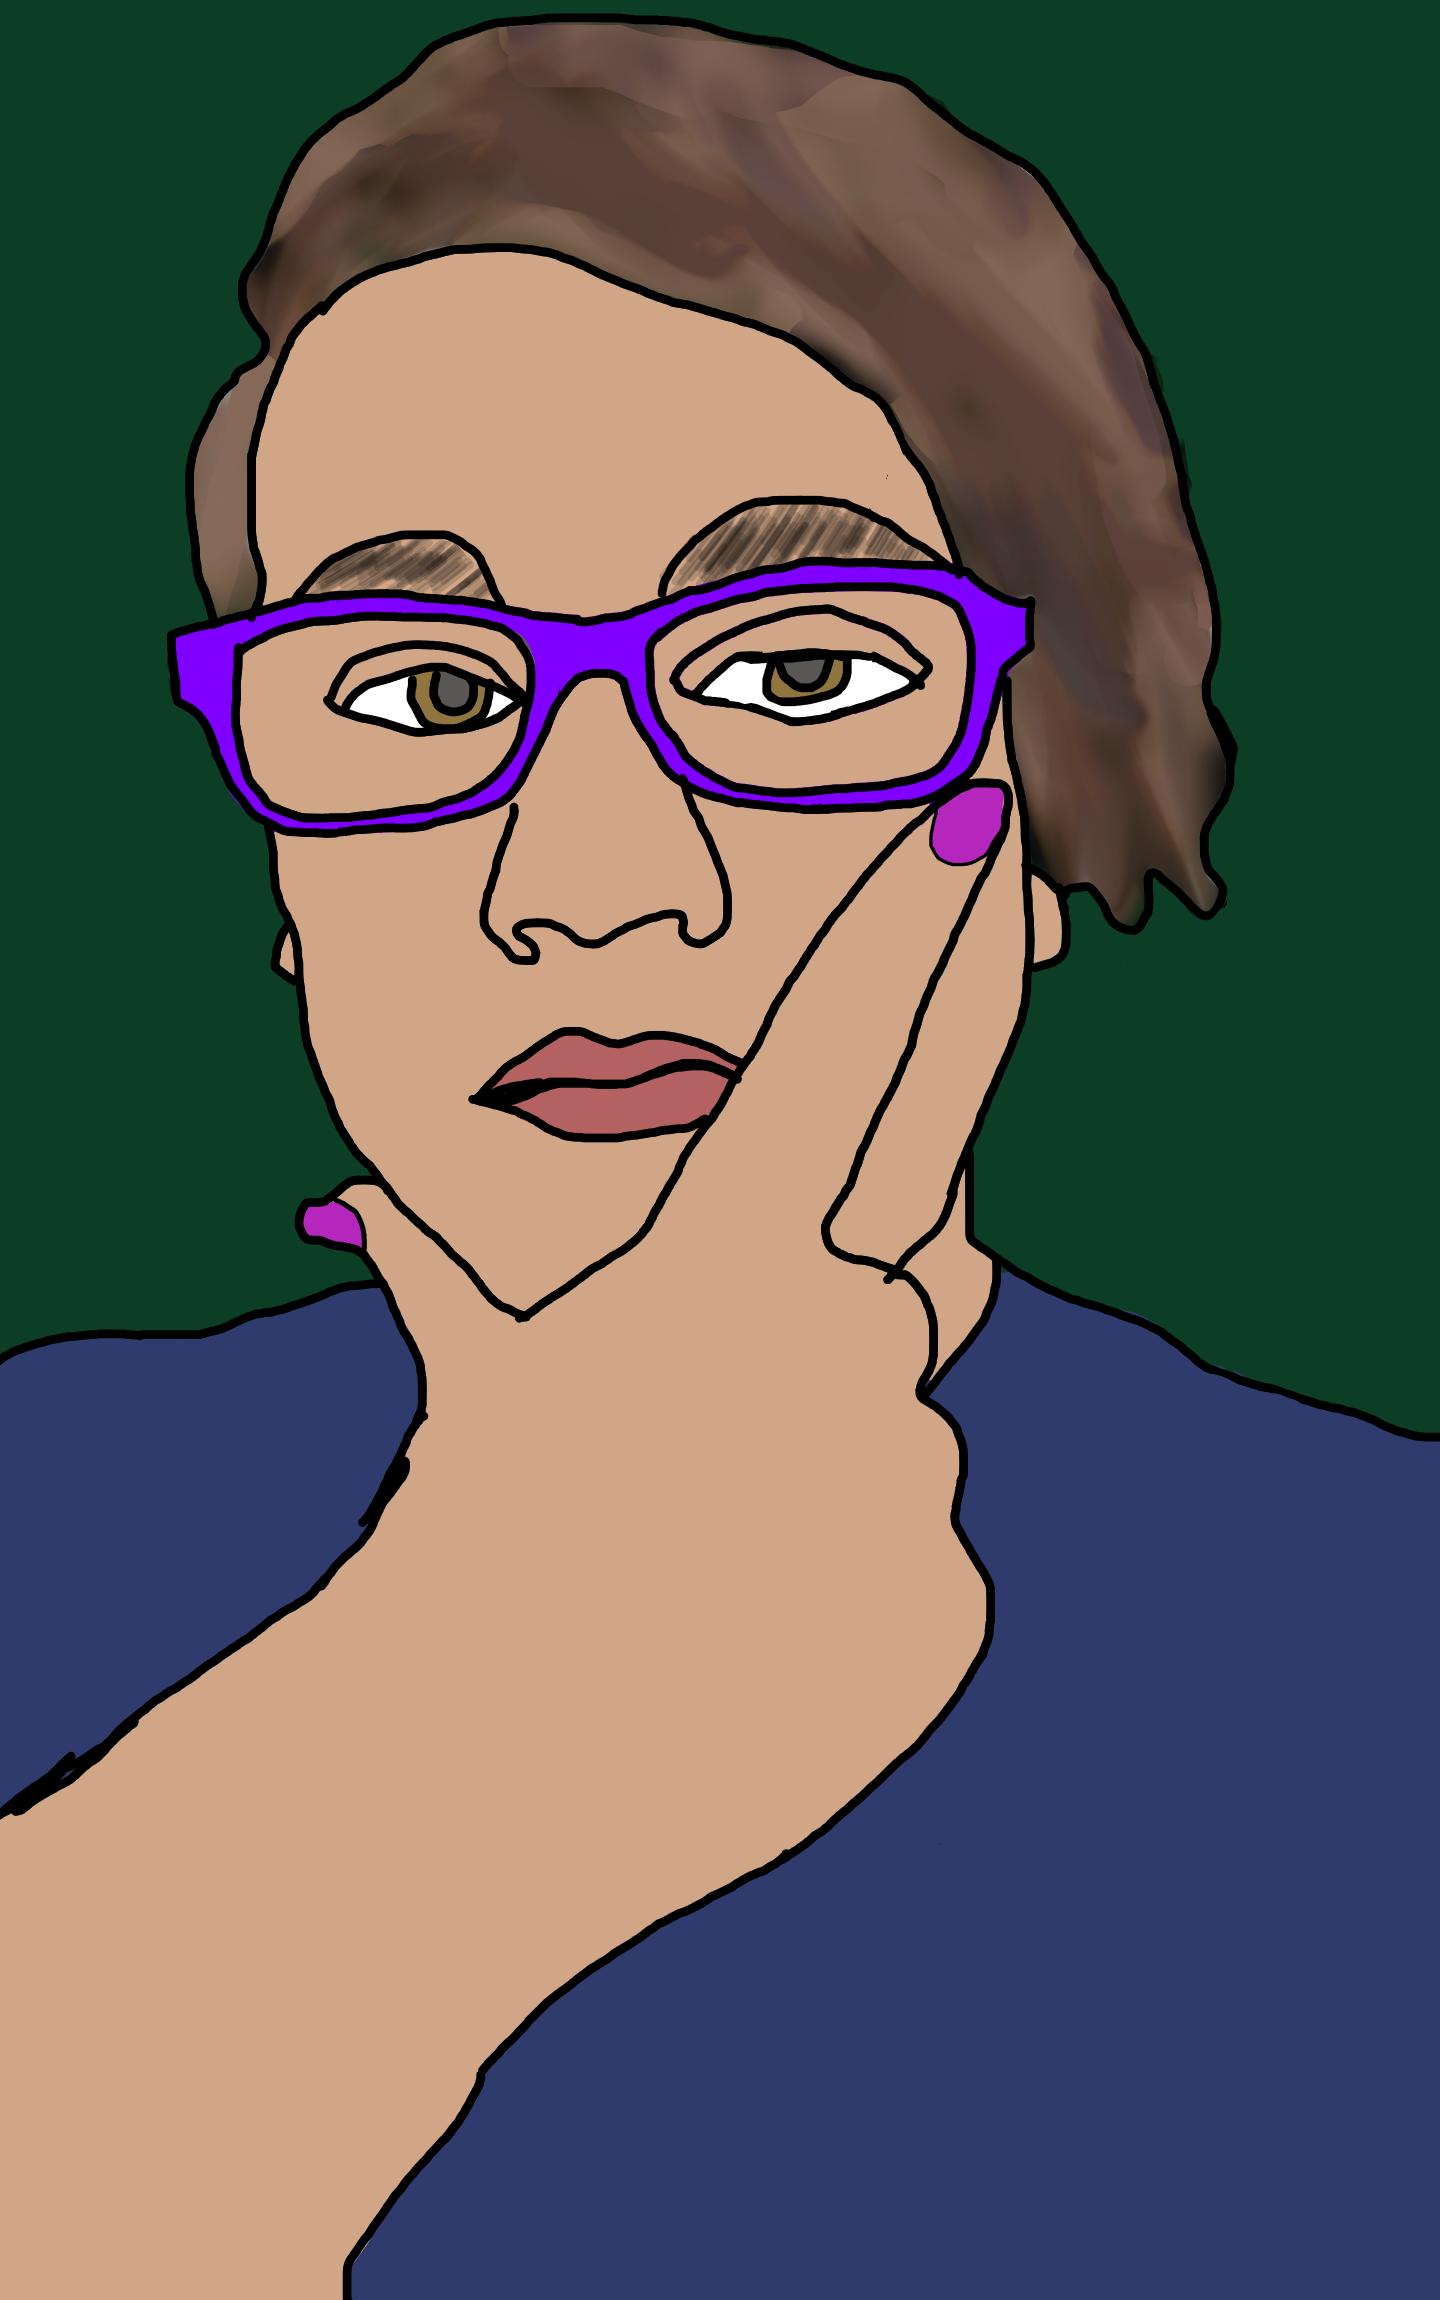 I Made Myself Into A Sketch Like Character